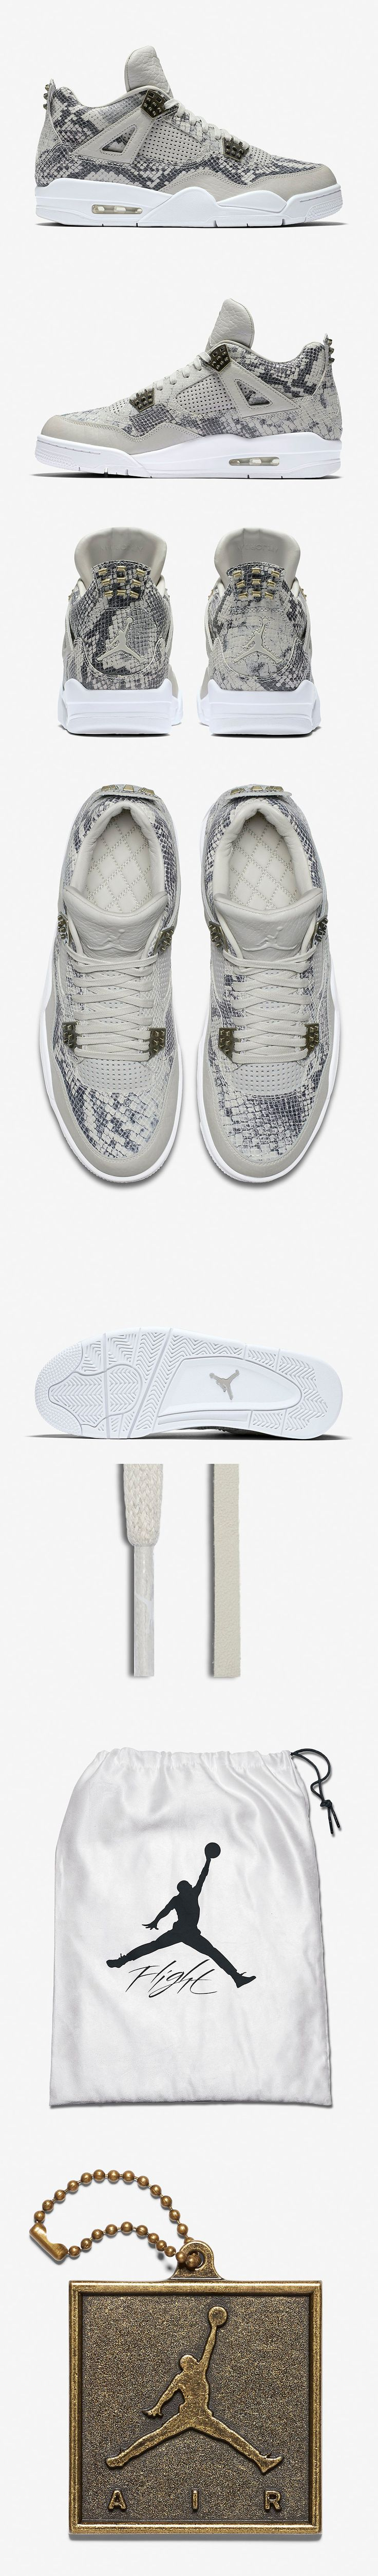 Air Jordan 4 Retro Premium Snakeskin - EU Kicks: Sneaker Magazine